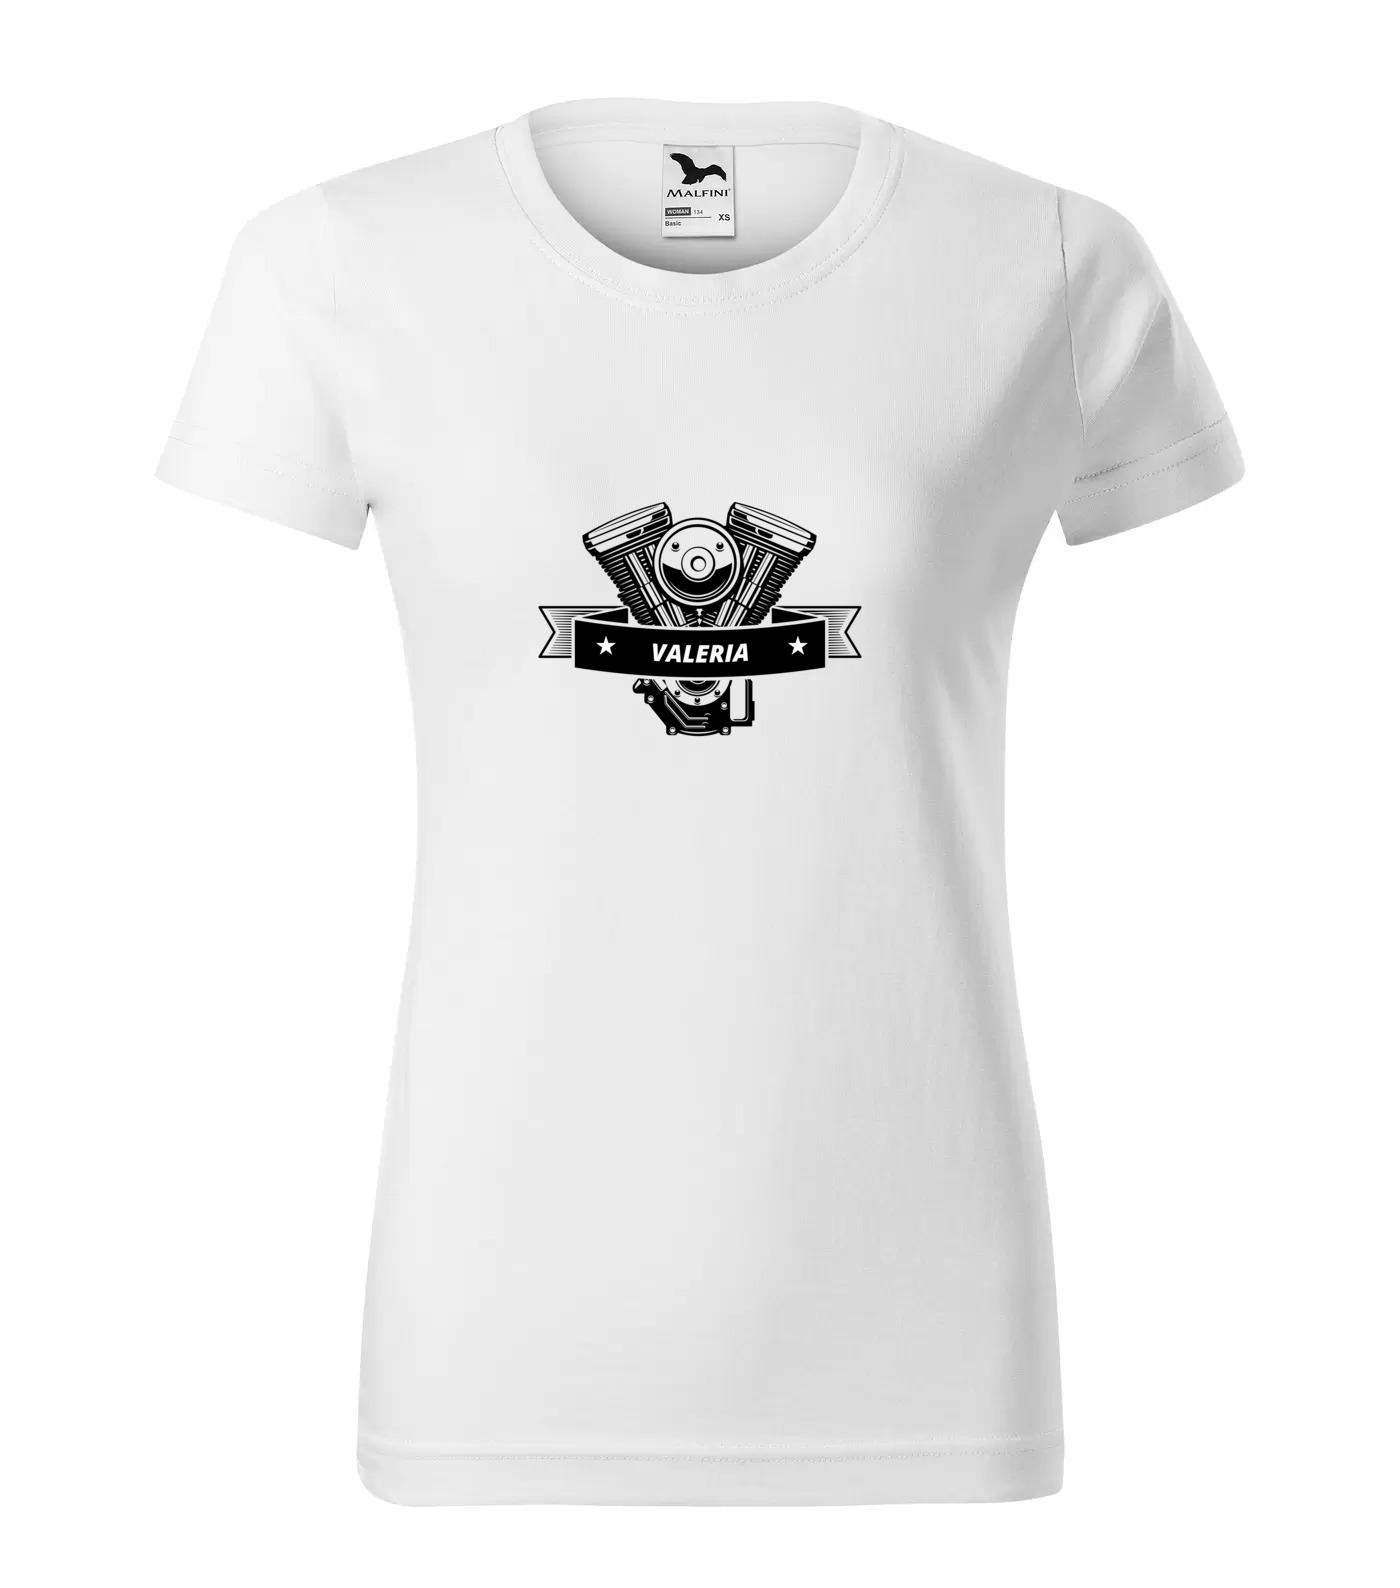 Tričko Motorkářka Valeria